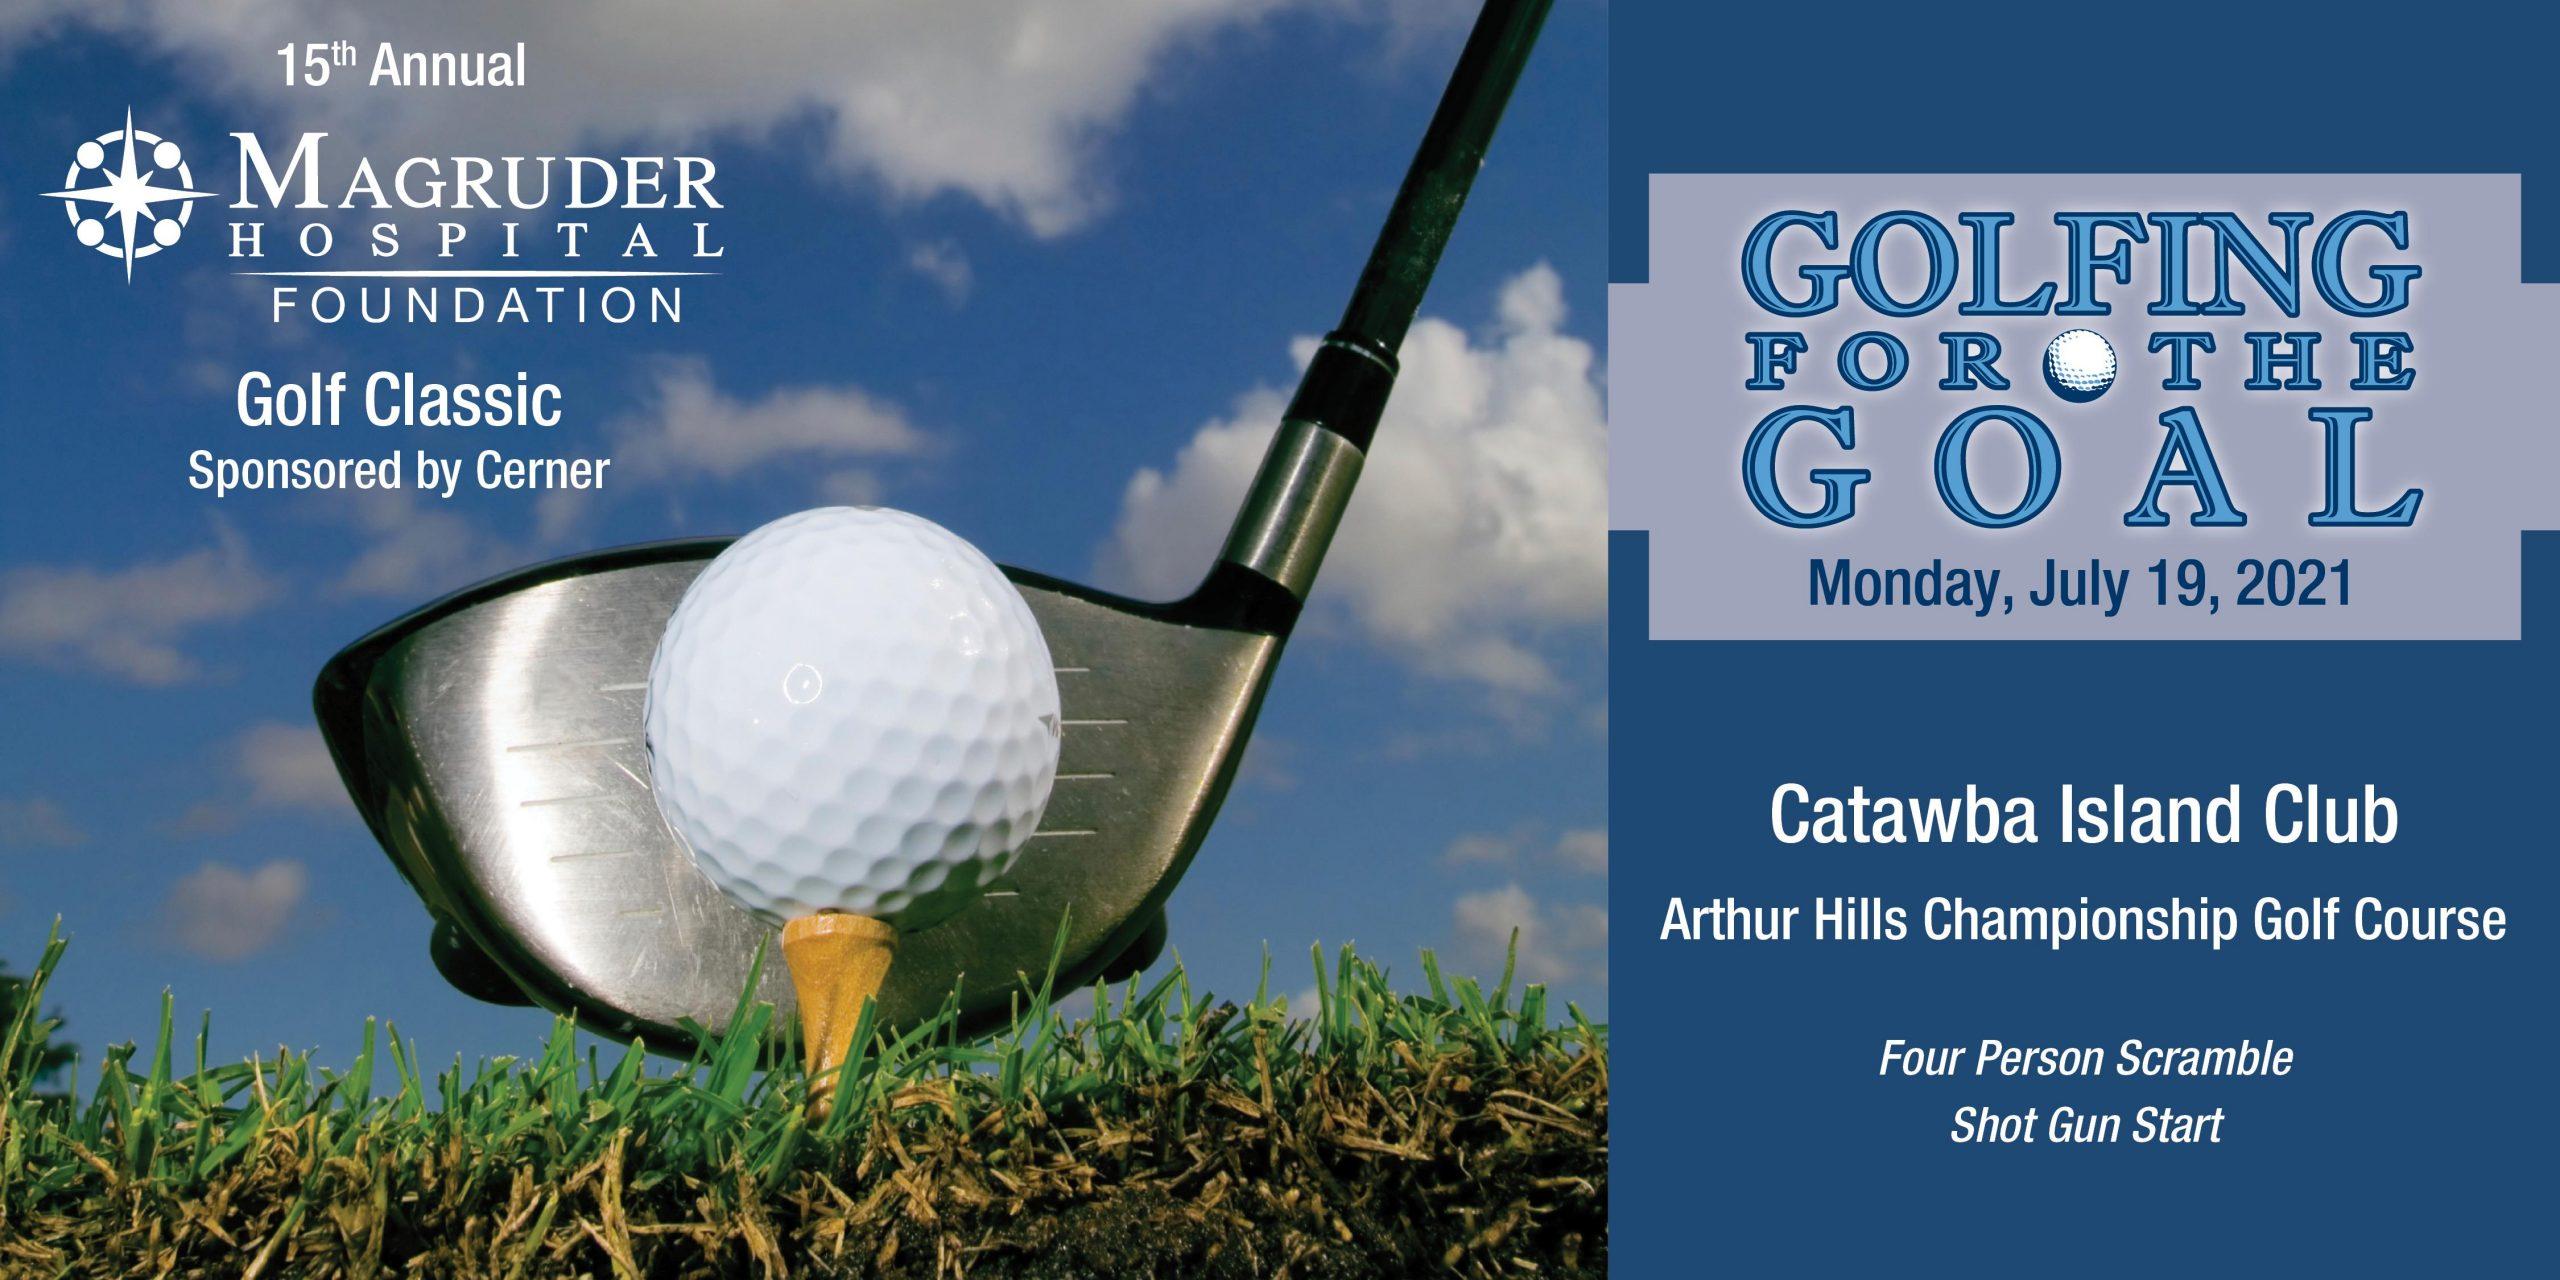 Magruder Hospital Foundation Golfing for the Goal